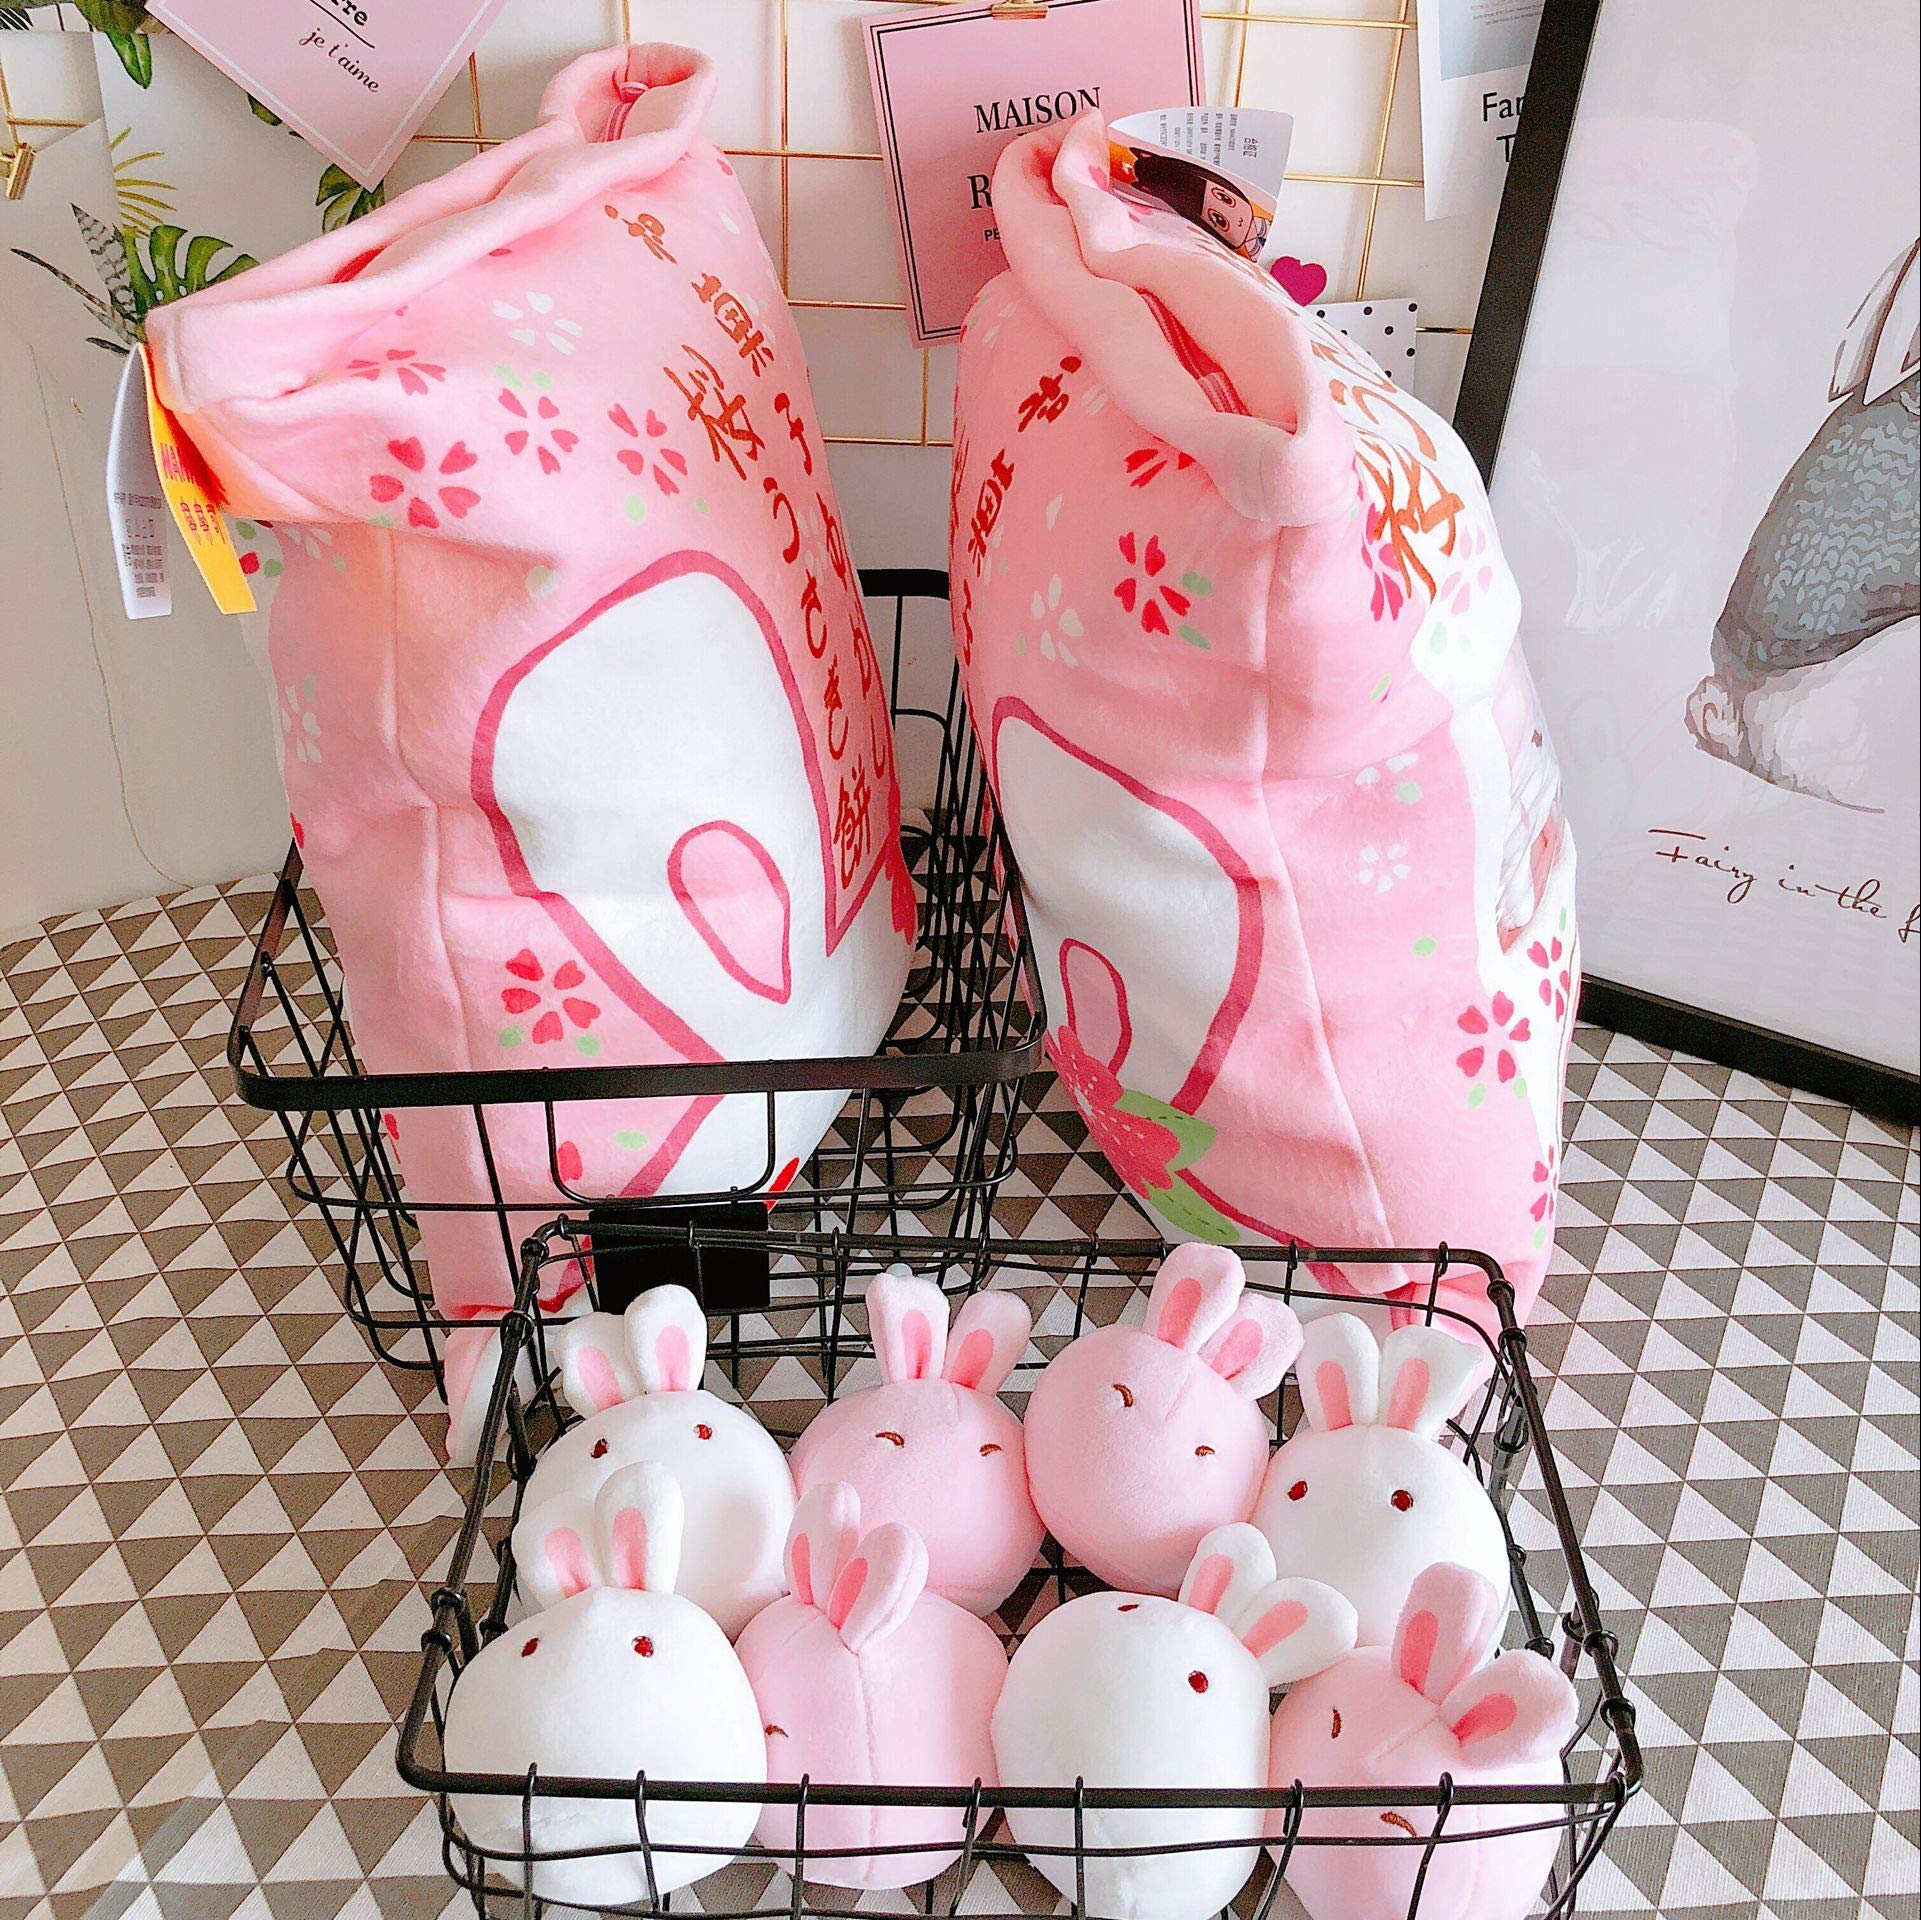 Nenalayo Cute Throw Pillow Stuffed Animal Toys Removable Fluffy Bunnies Creative Gifts for Teens Girls Kids by Nenalayo (Image #8)